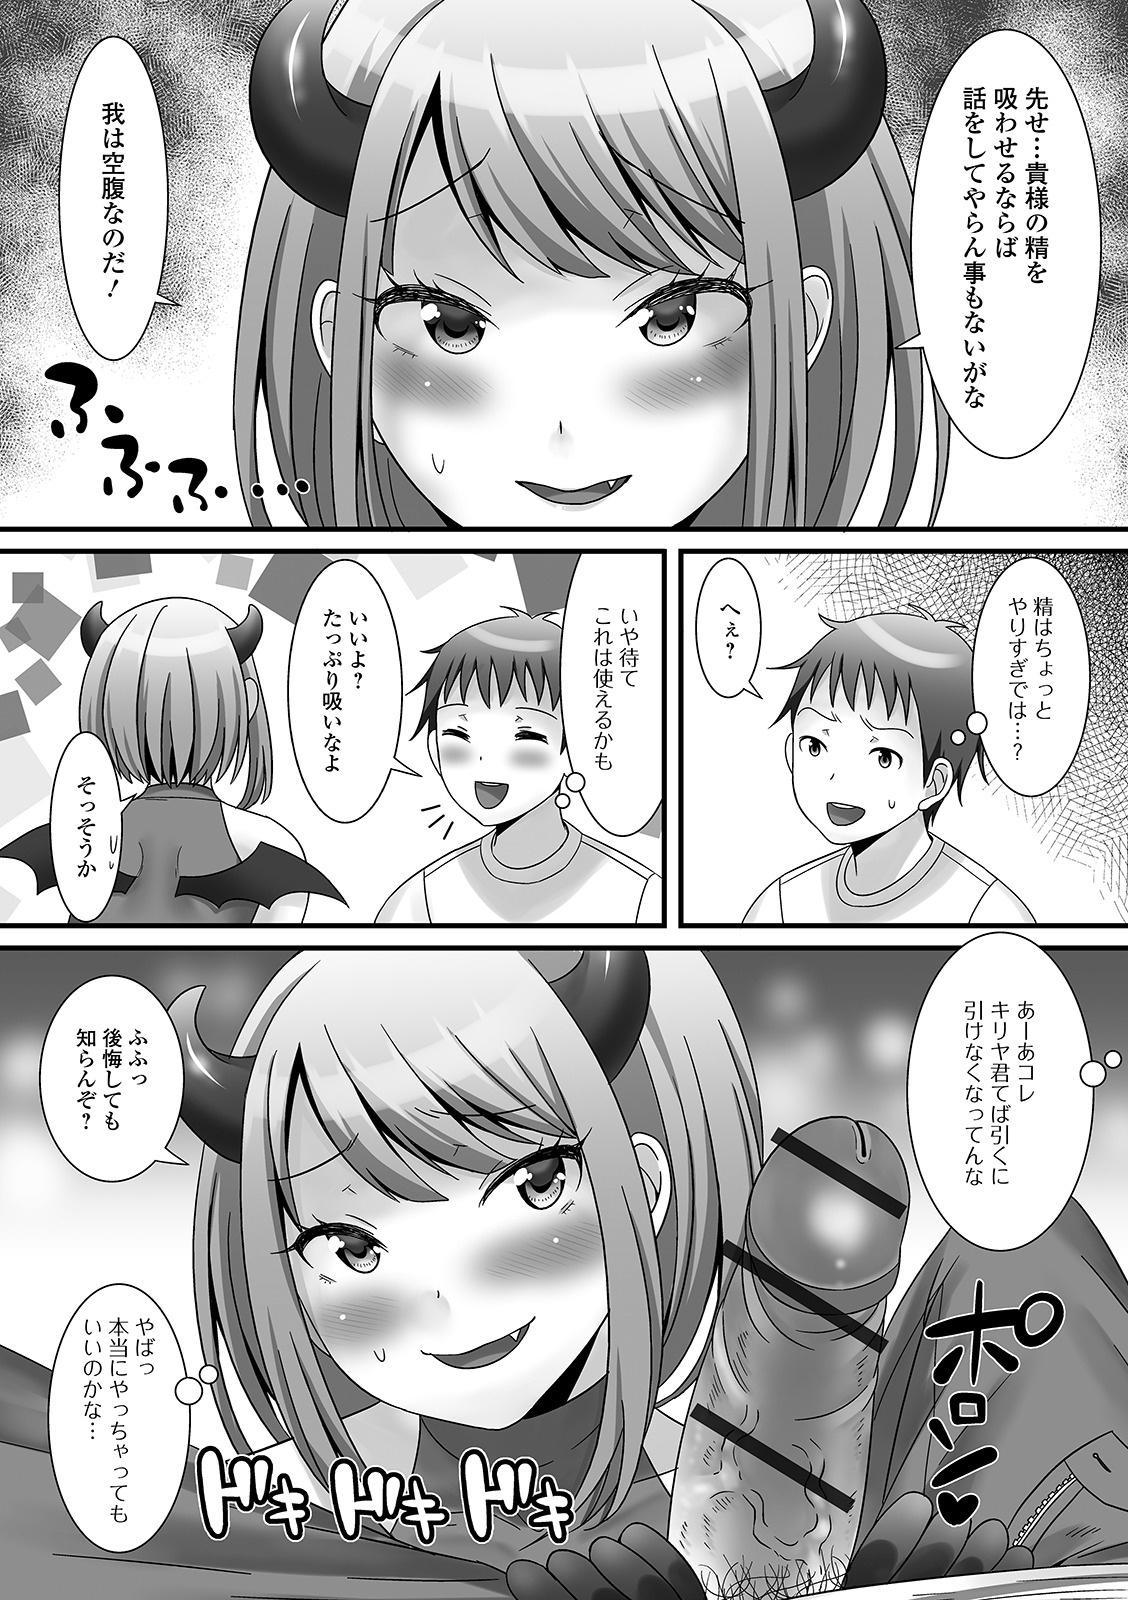 Gekkan Web Otoko no Ko-llection! S Vol. 53 37